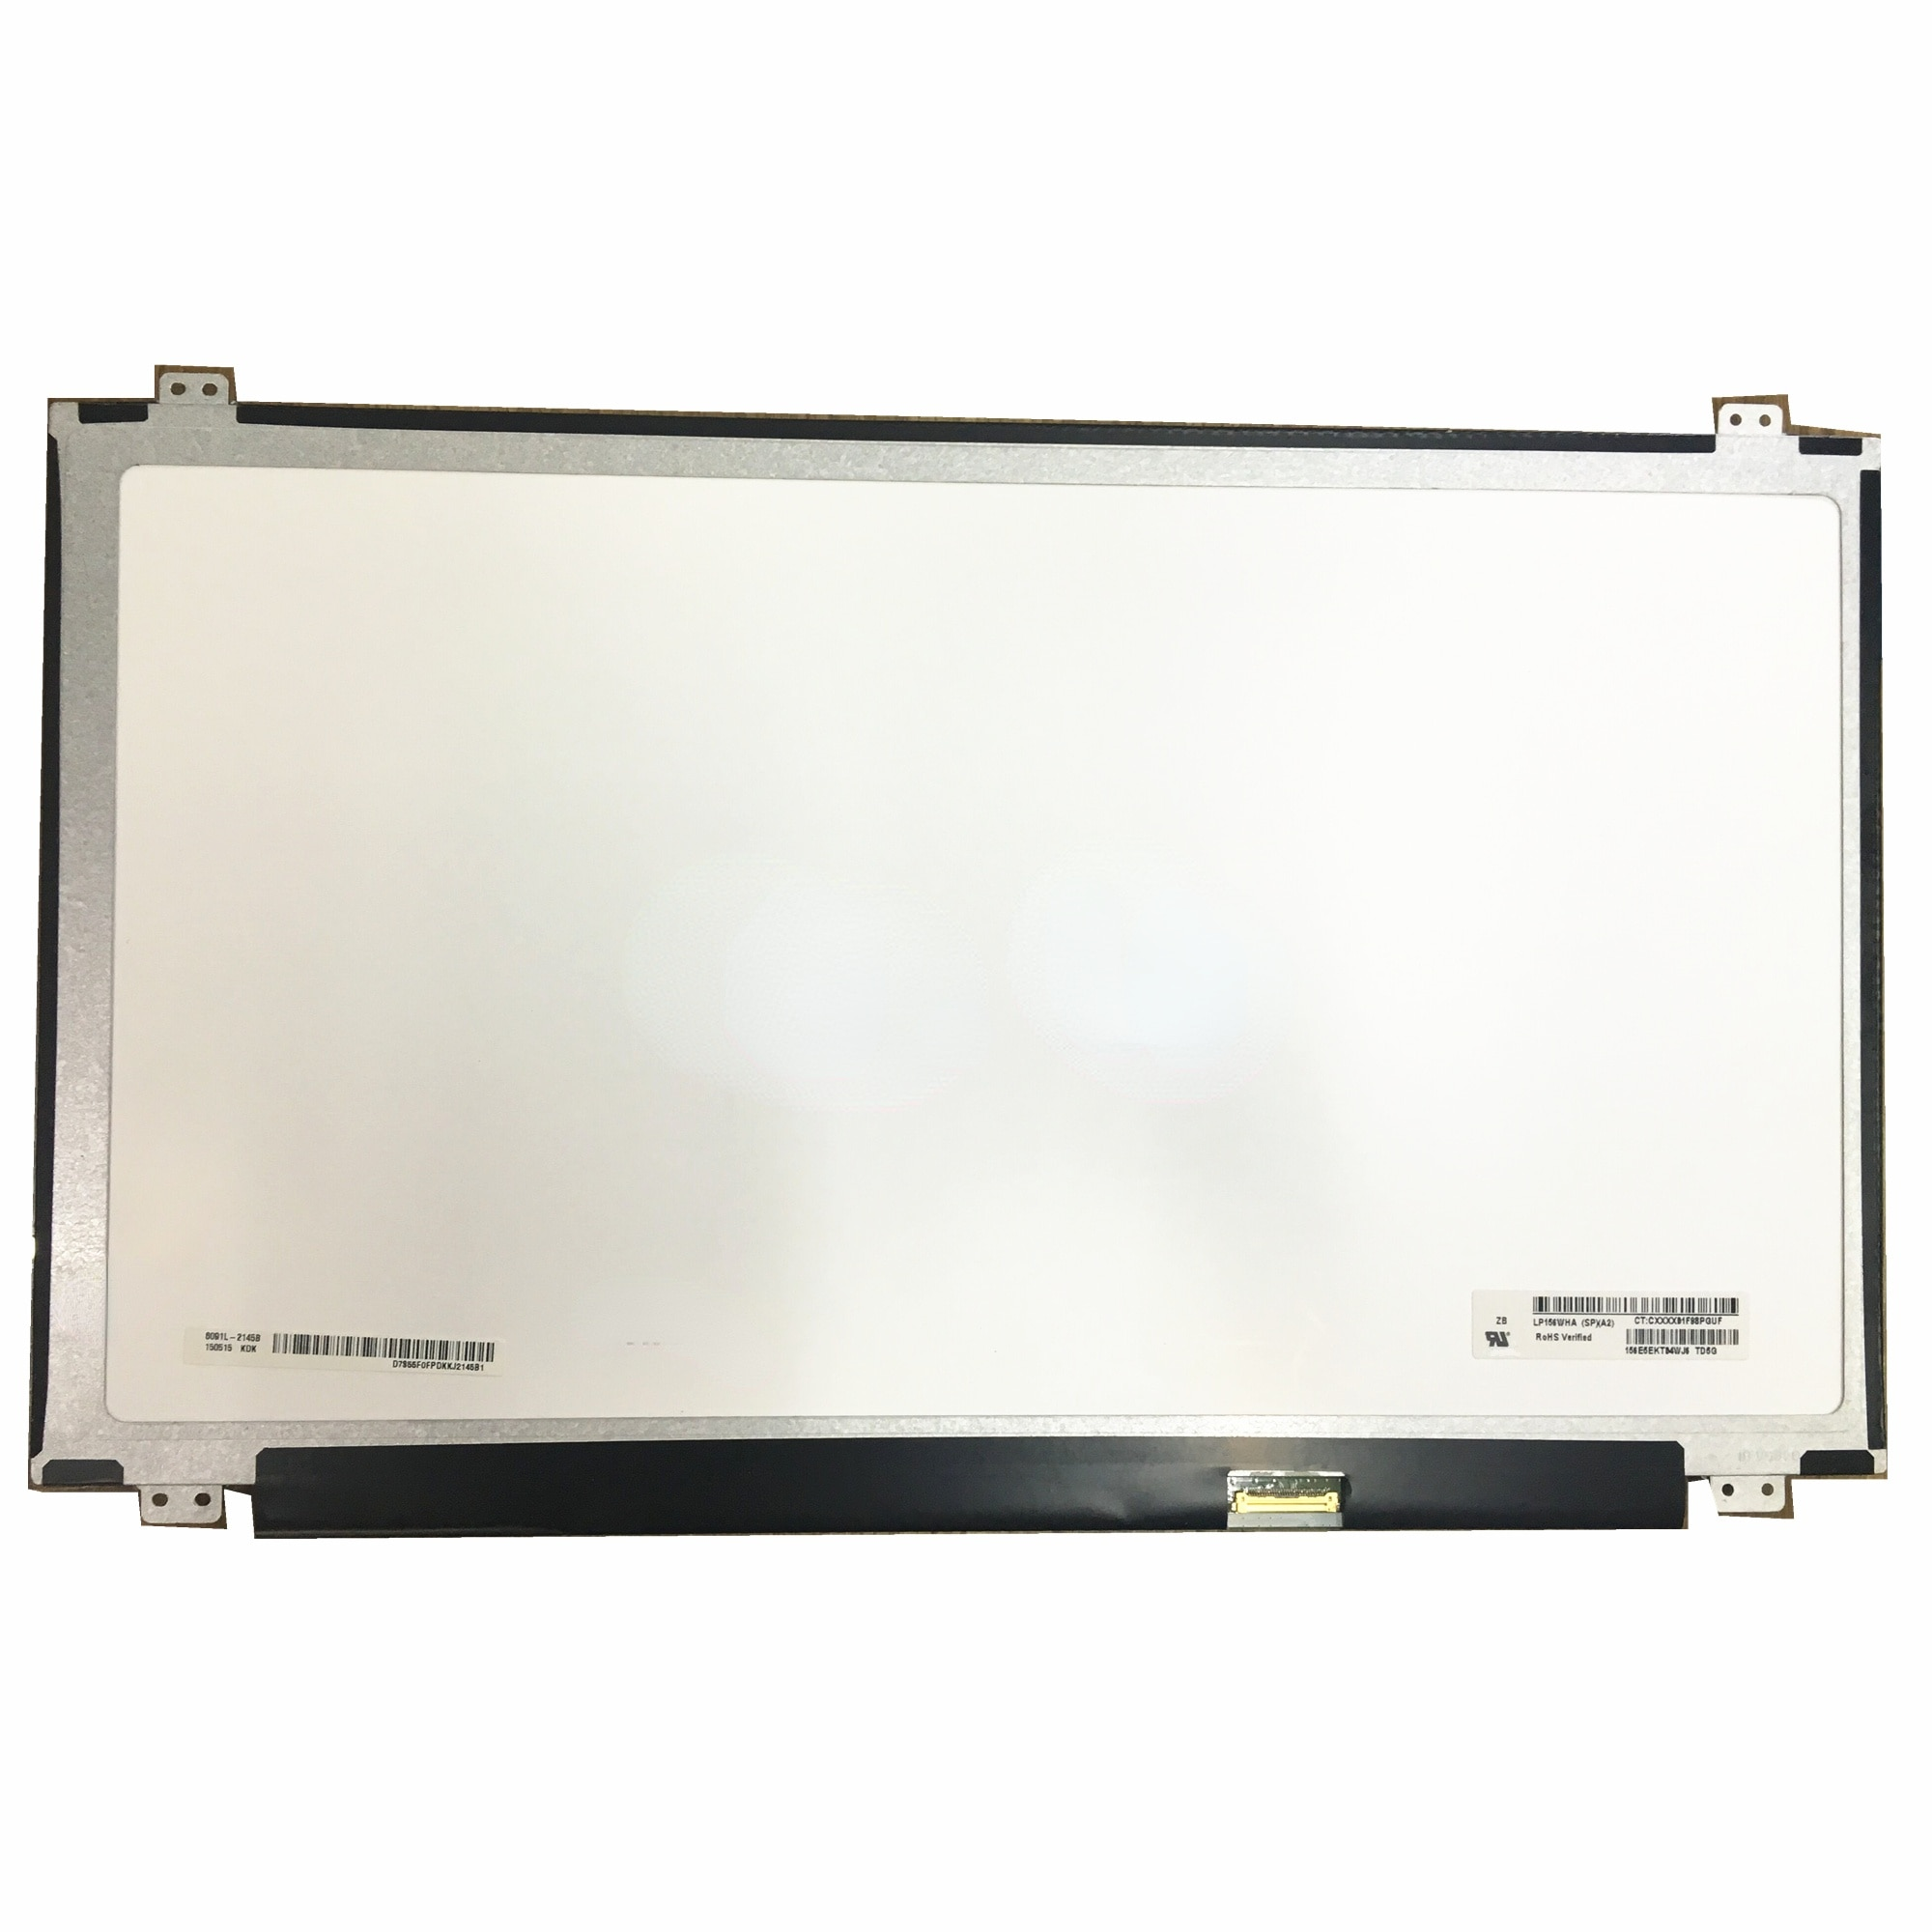 LP156WHA-SPA2 LP156WHA SPA2 SPA1 15.6 ''IPS شاشة لاب توب LCD 1366*768 EDP 30 دبابيس